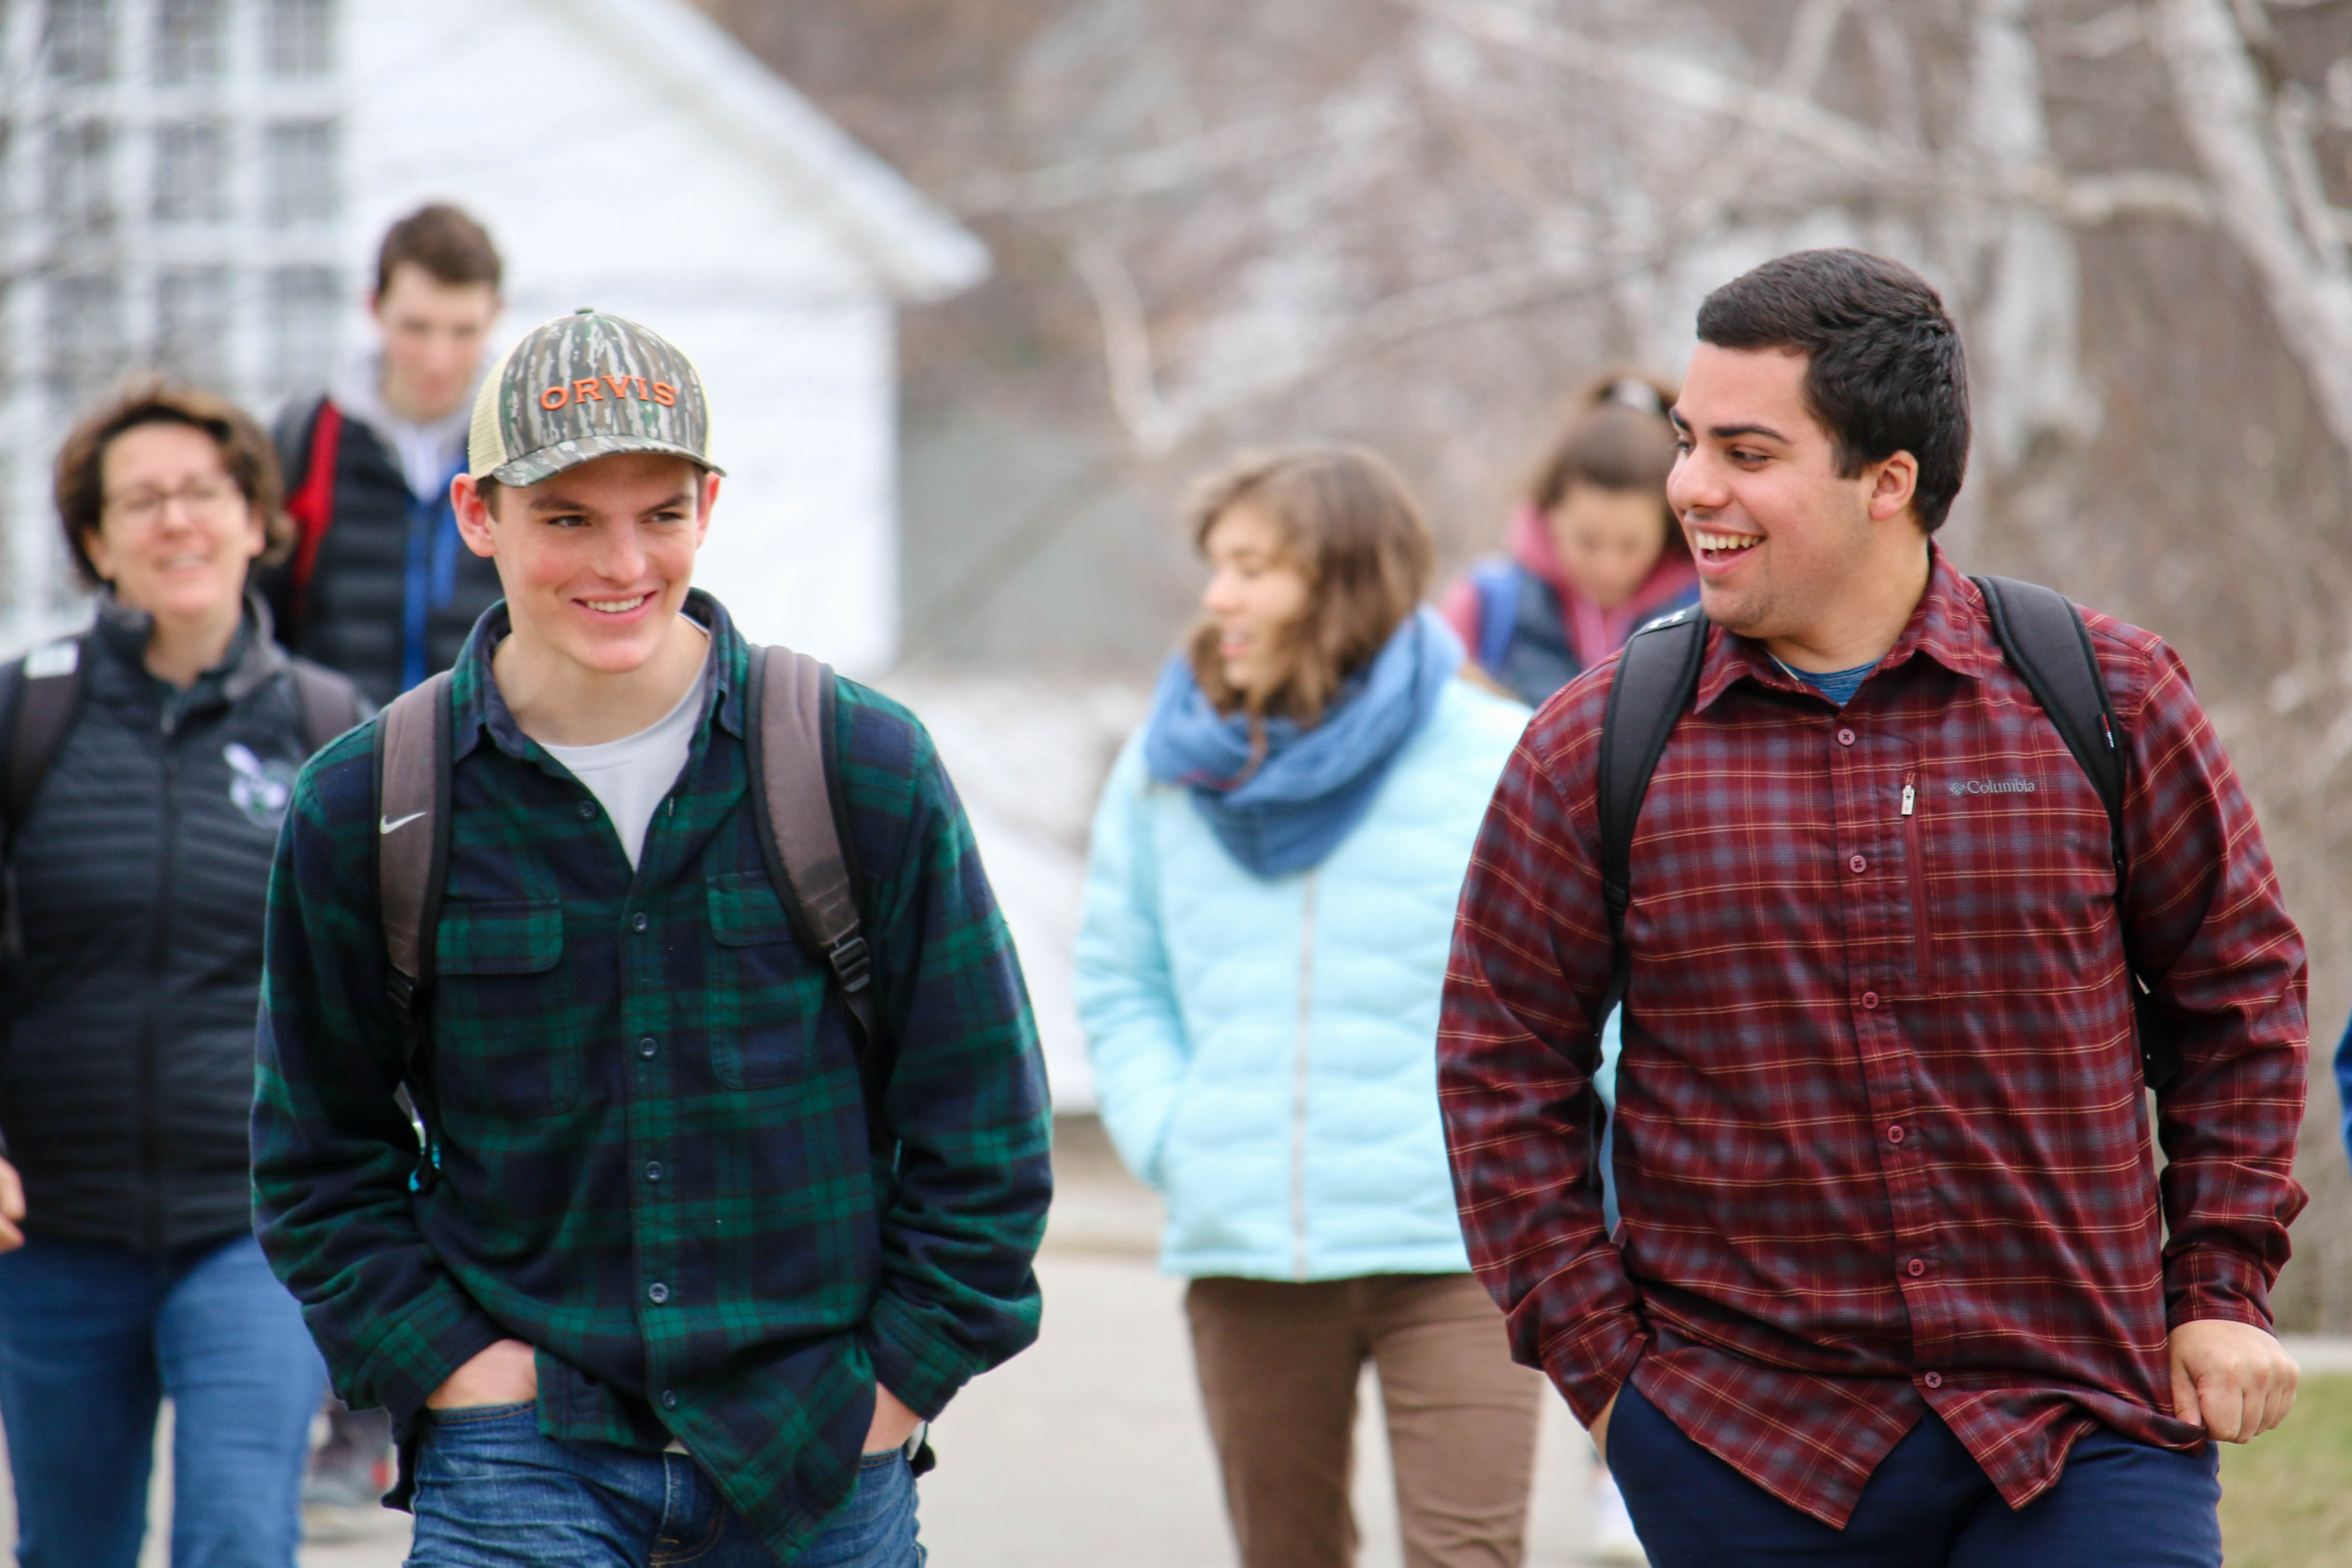 Proctor Academy Boarding School Admissions